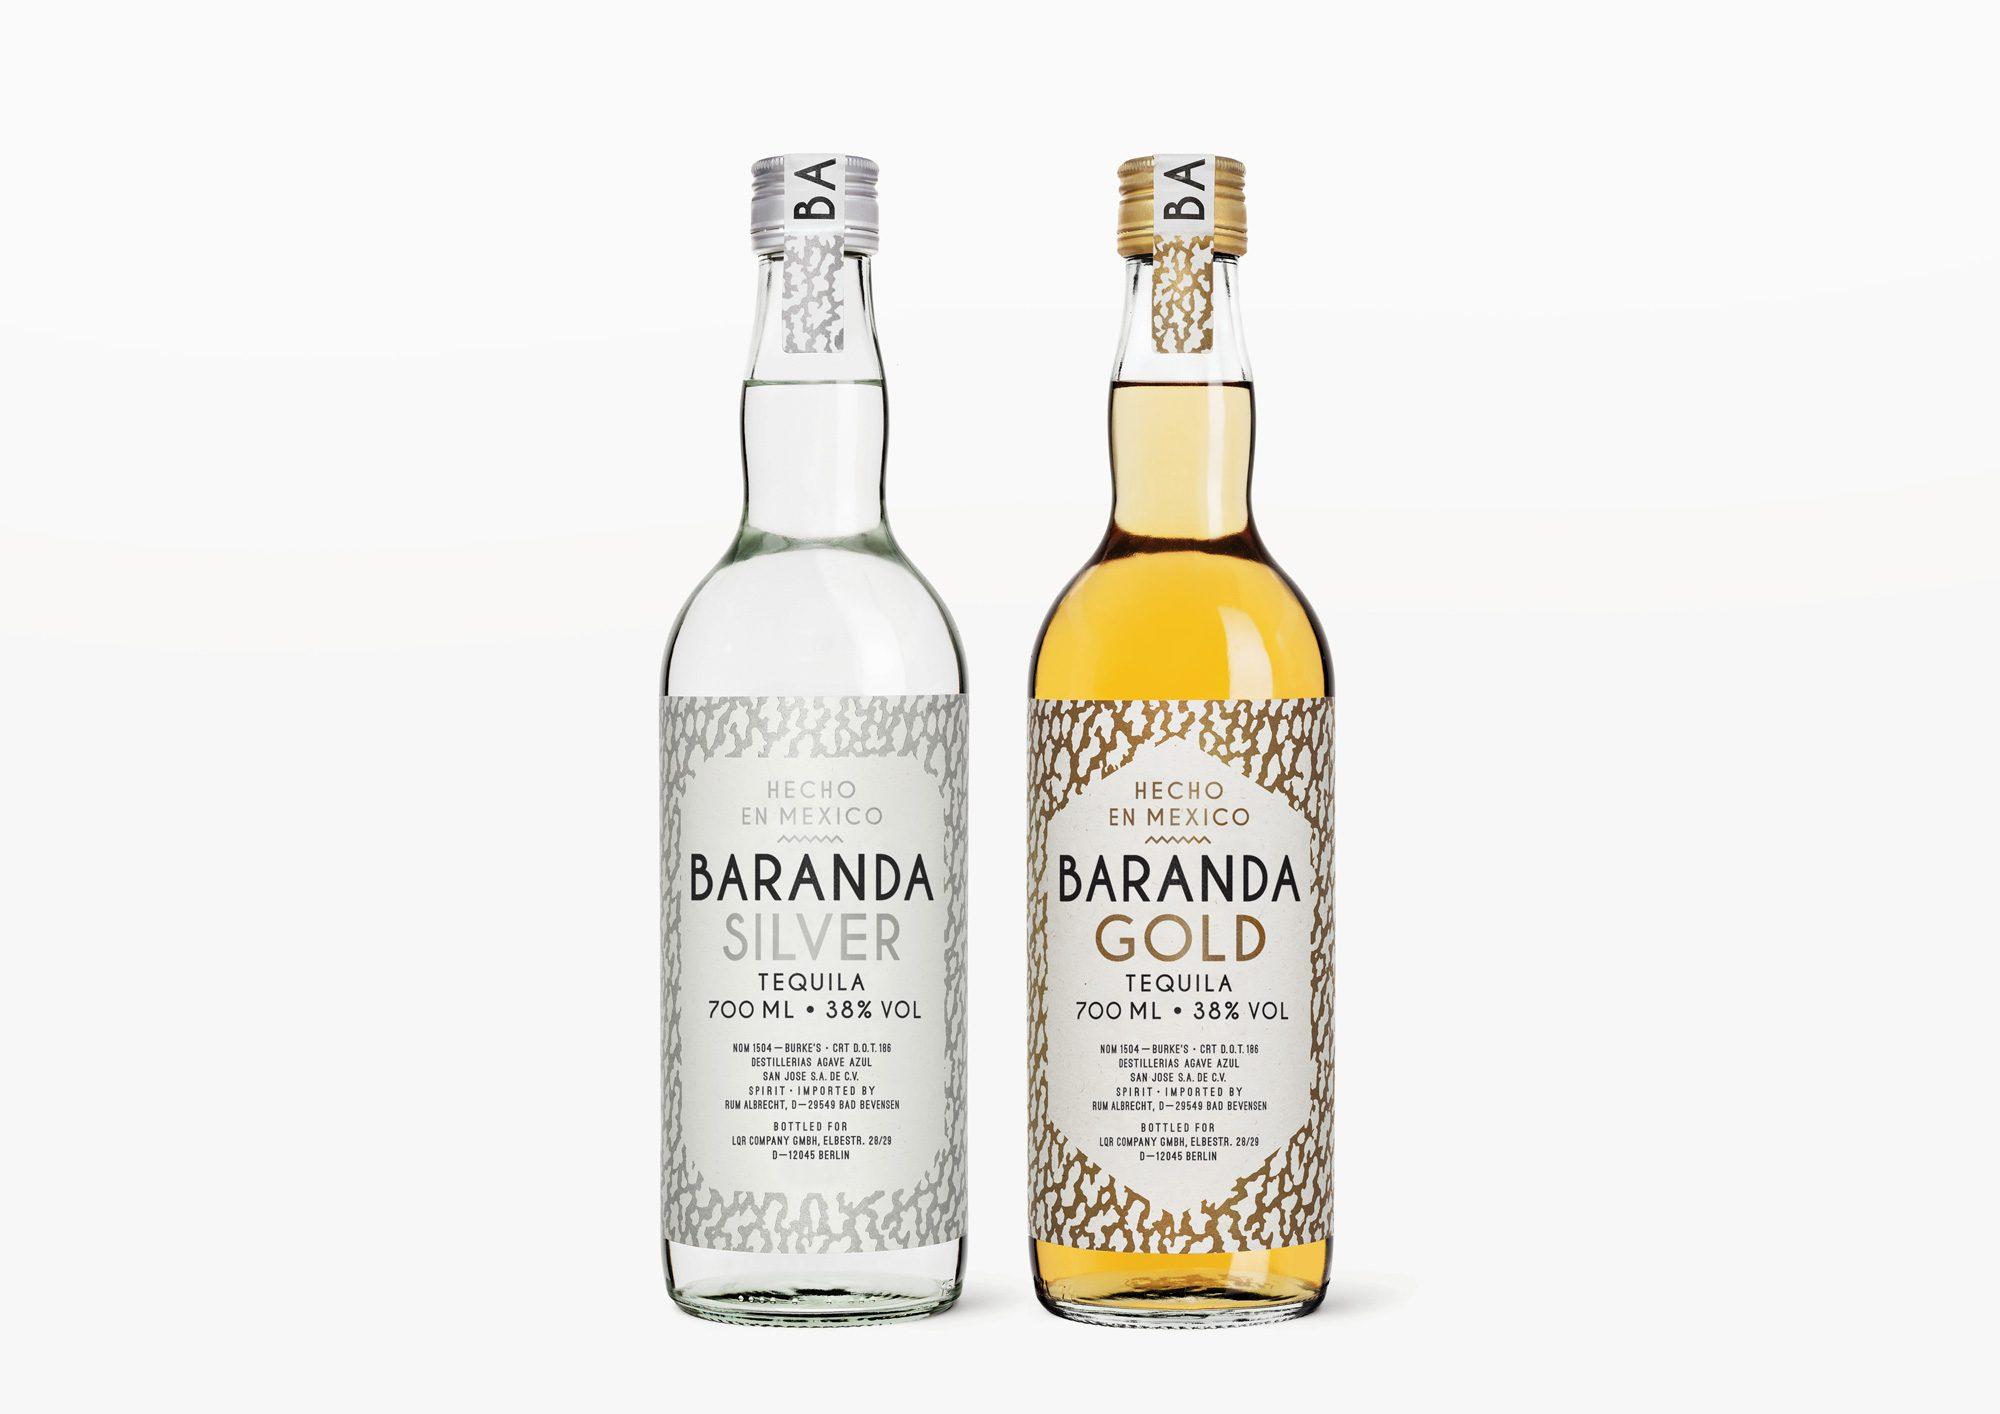 Baranda Tequila